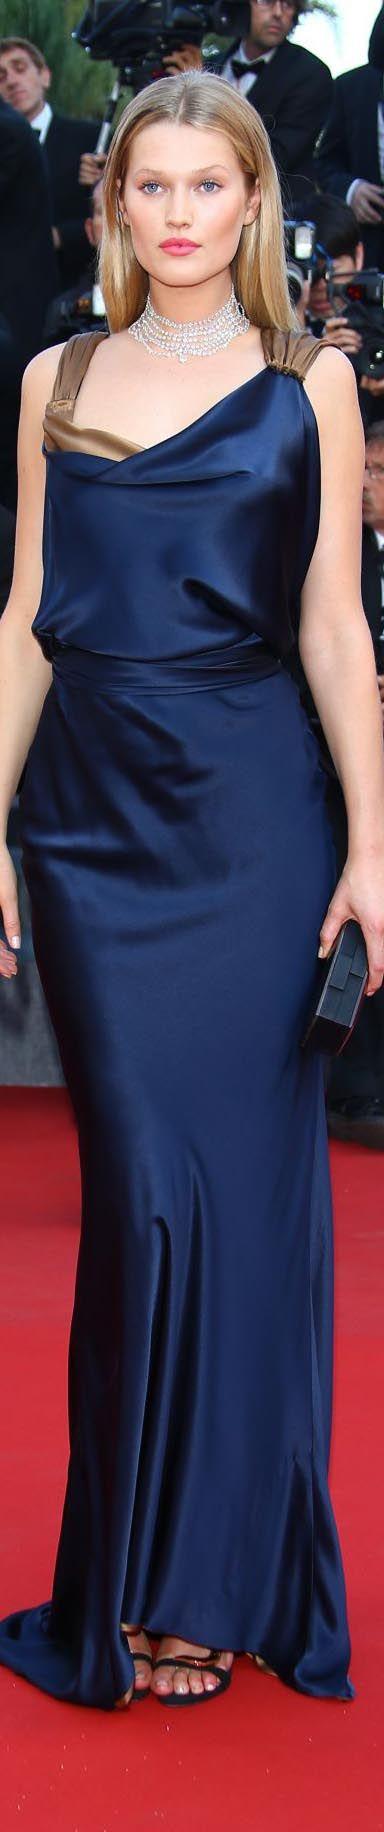 Toni Garrn - Premiere of Carol - Cannes 2015